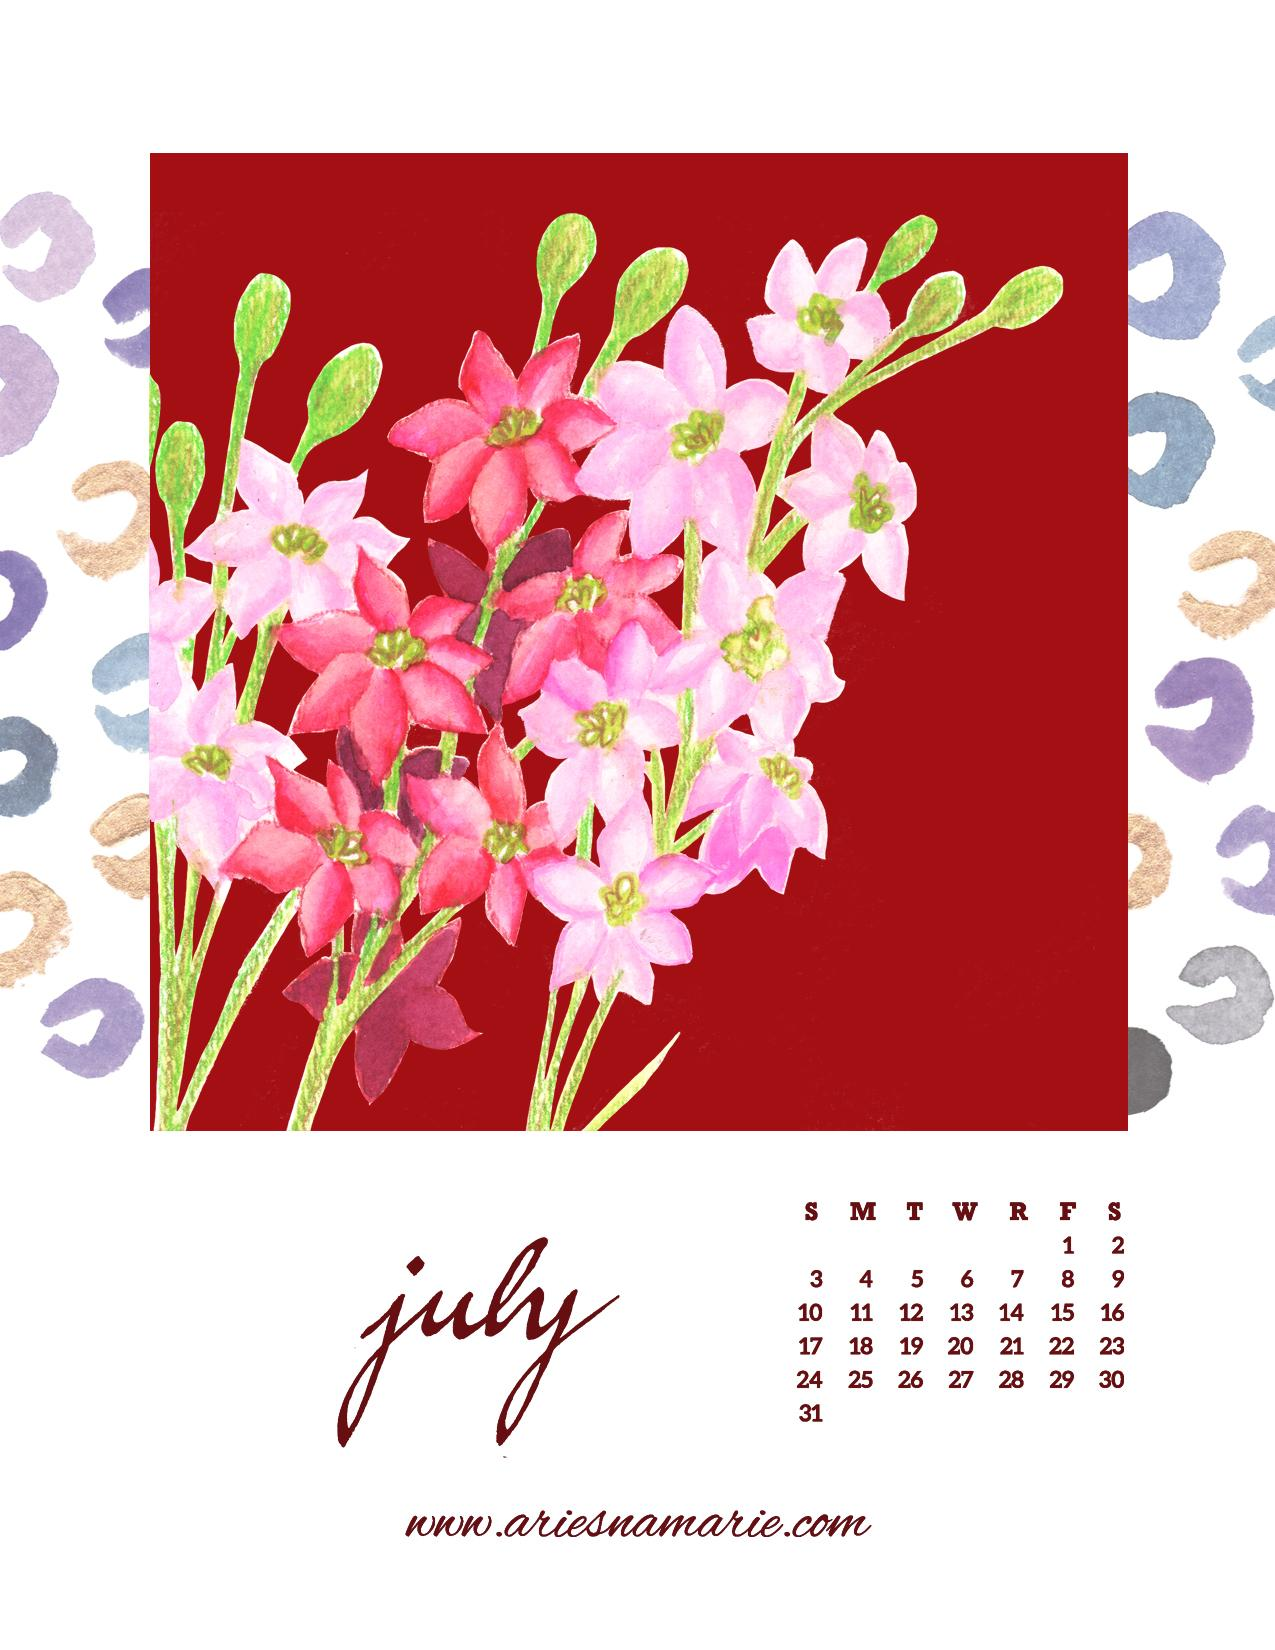 Birth Month Flowers Calendar | Skillshare Projects